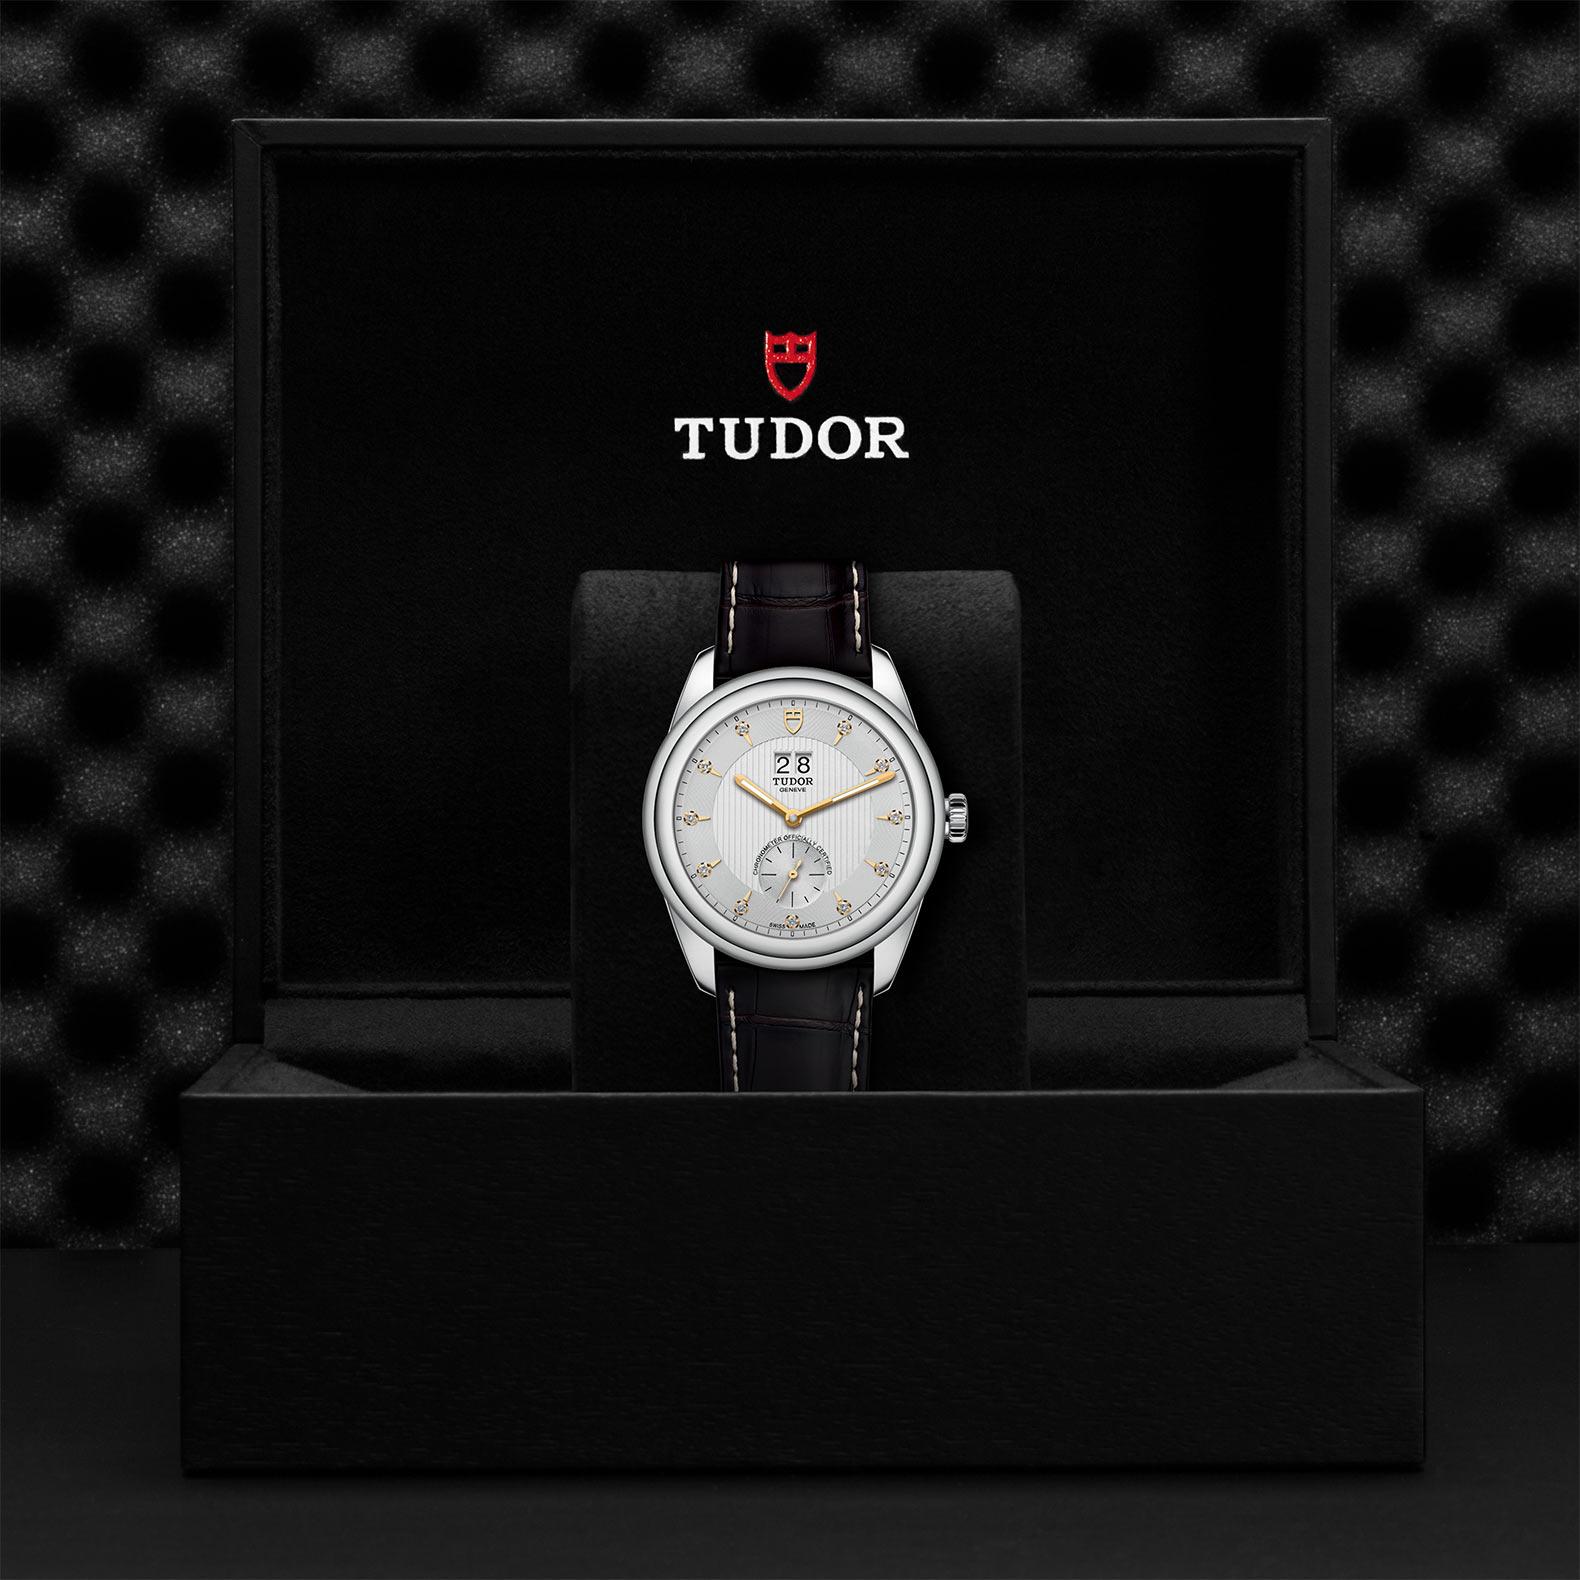 TUDOR Glamour Double Date - M57100-0020